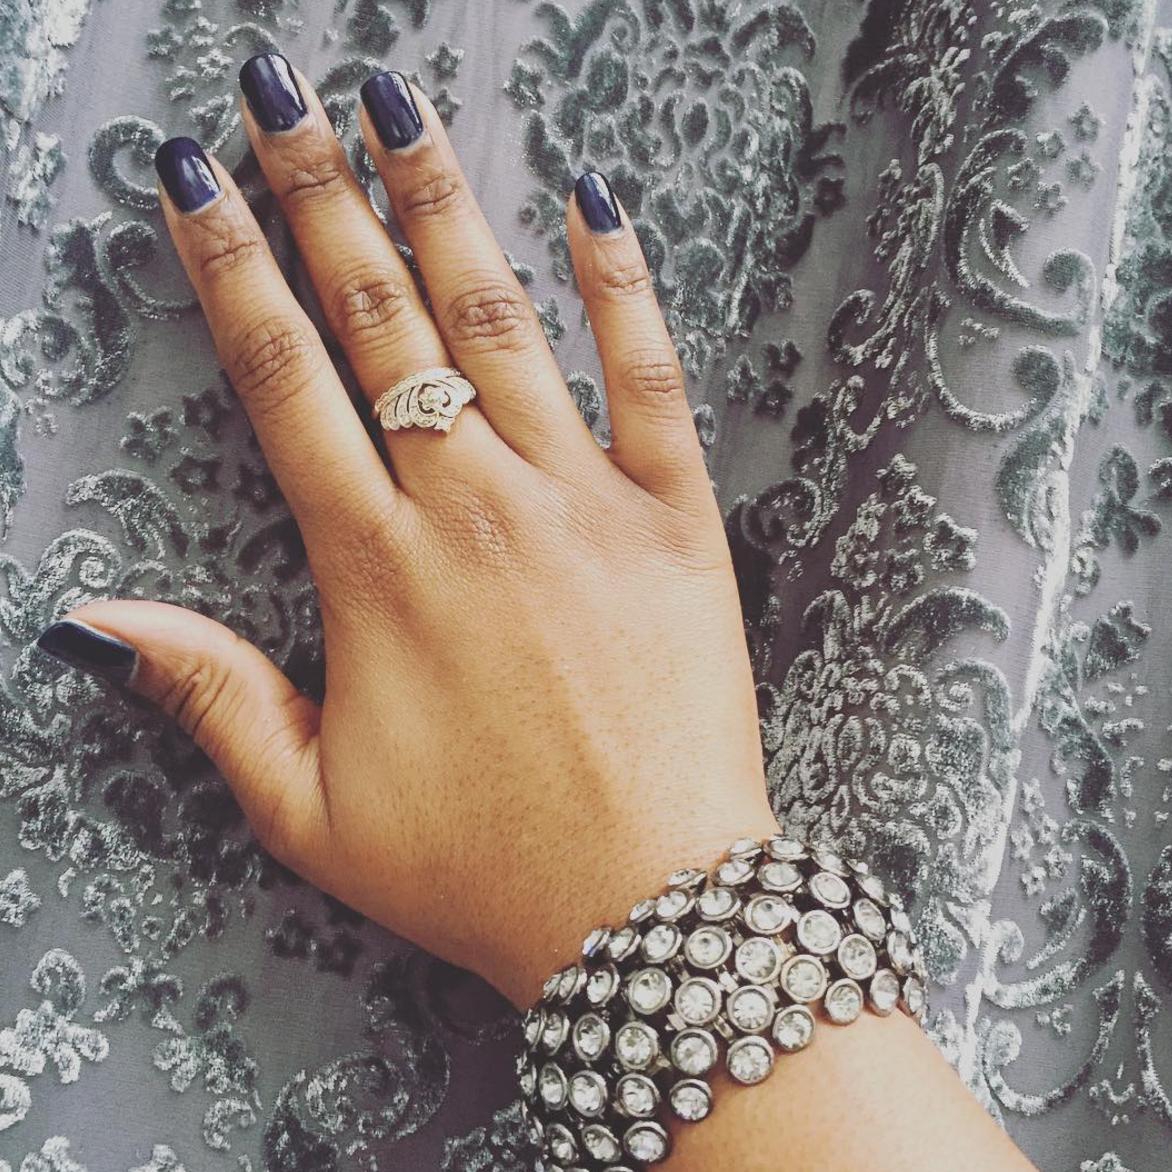 Russian Blue shellac manicure